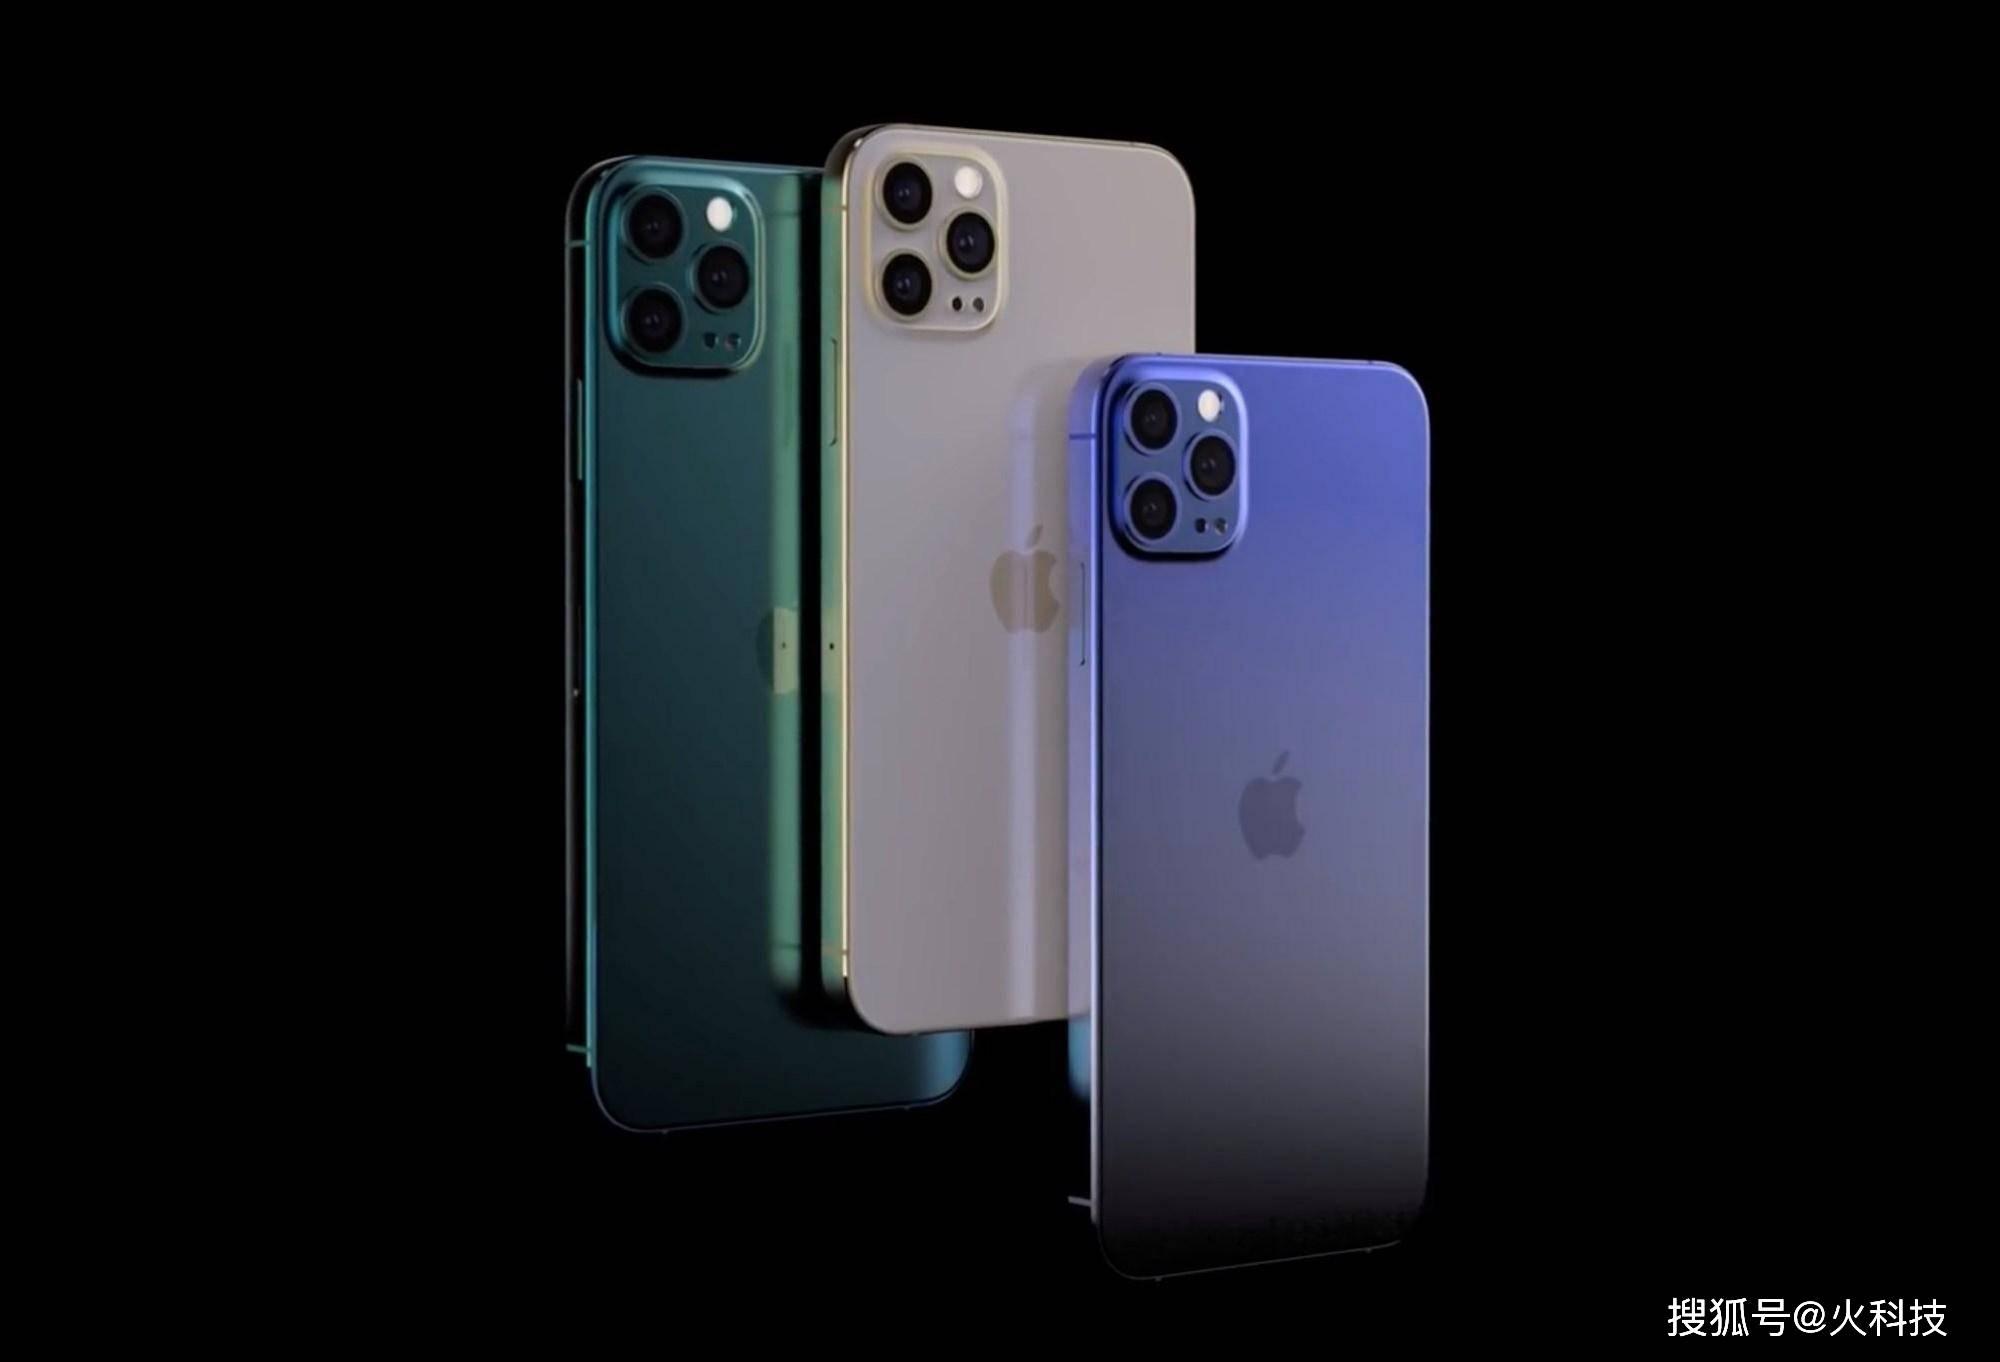 iPhone12稳了!富士康废除假期赶紧损耗新款iPhone12系列手机